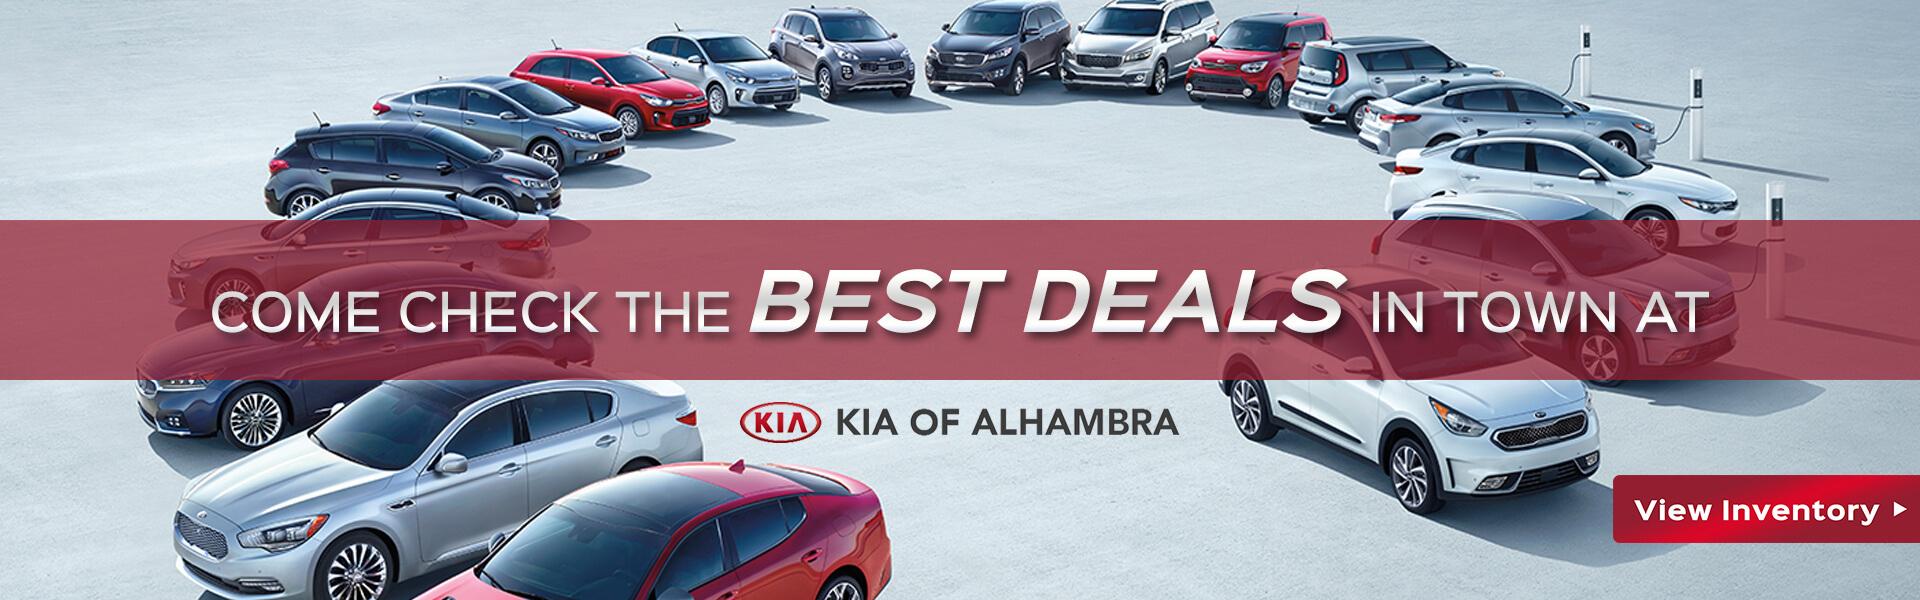 Kia Car Play